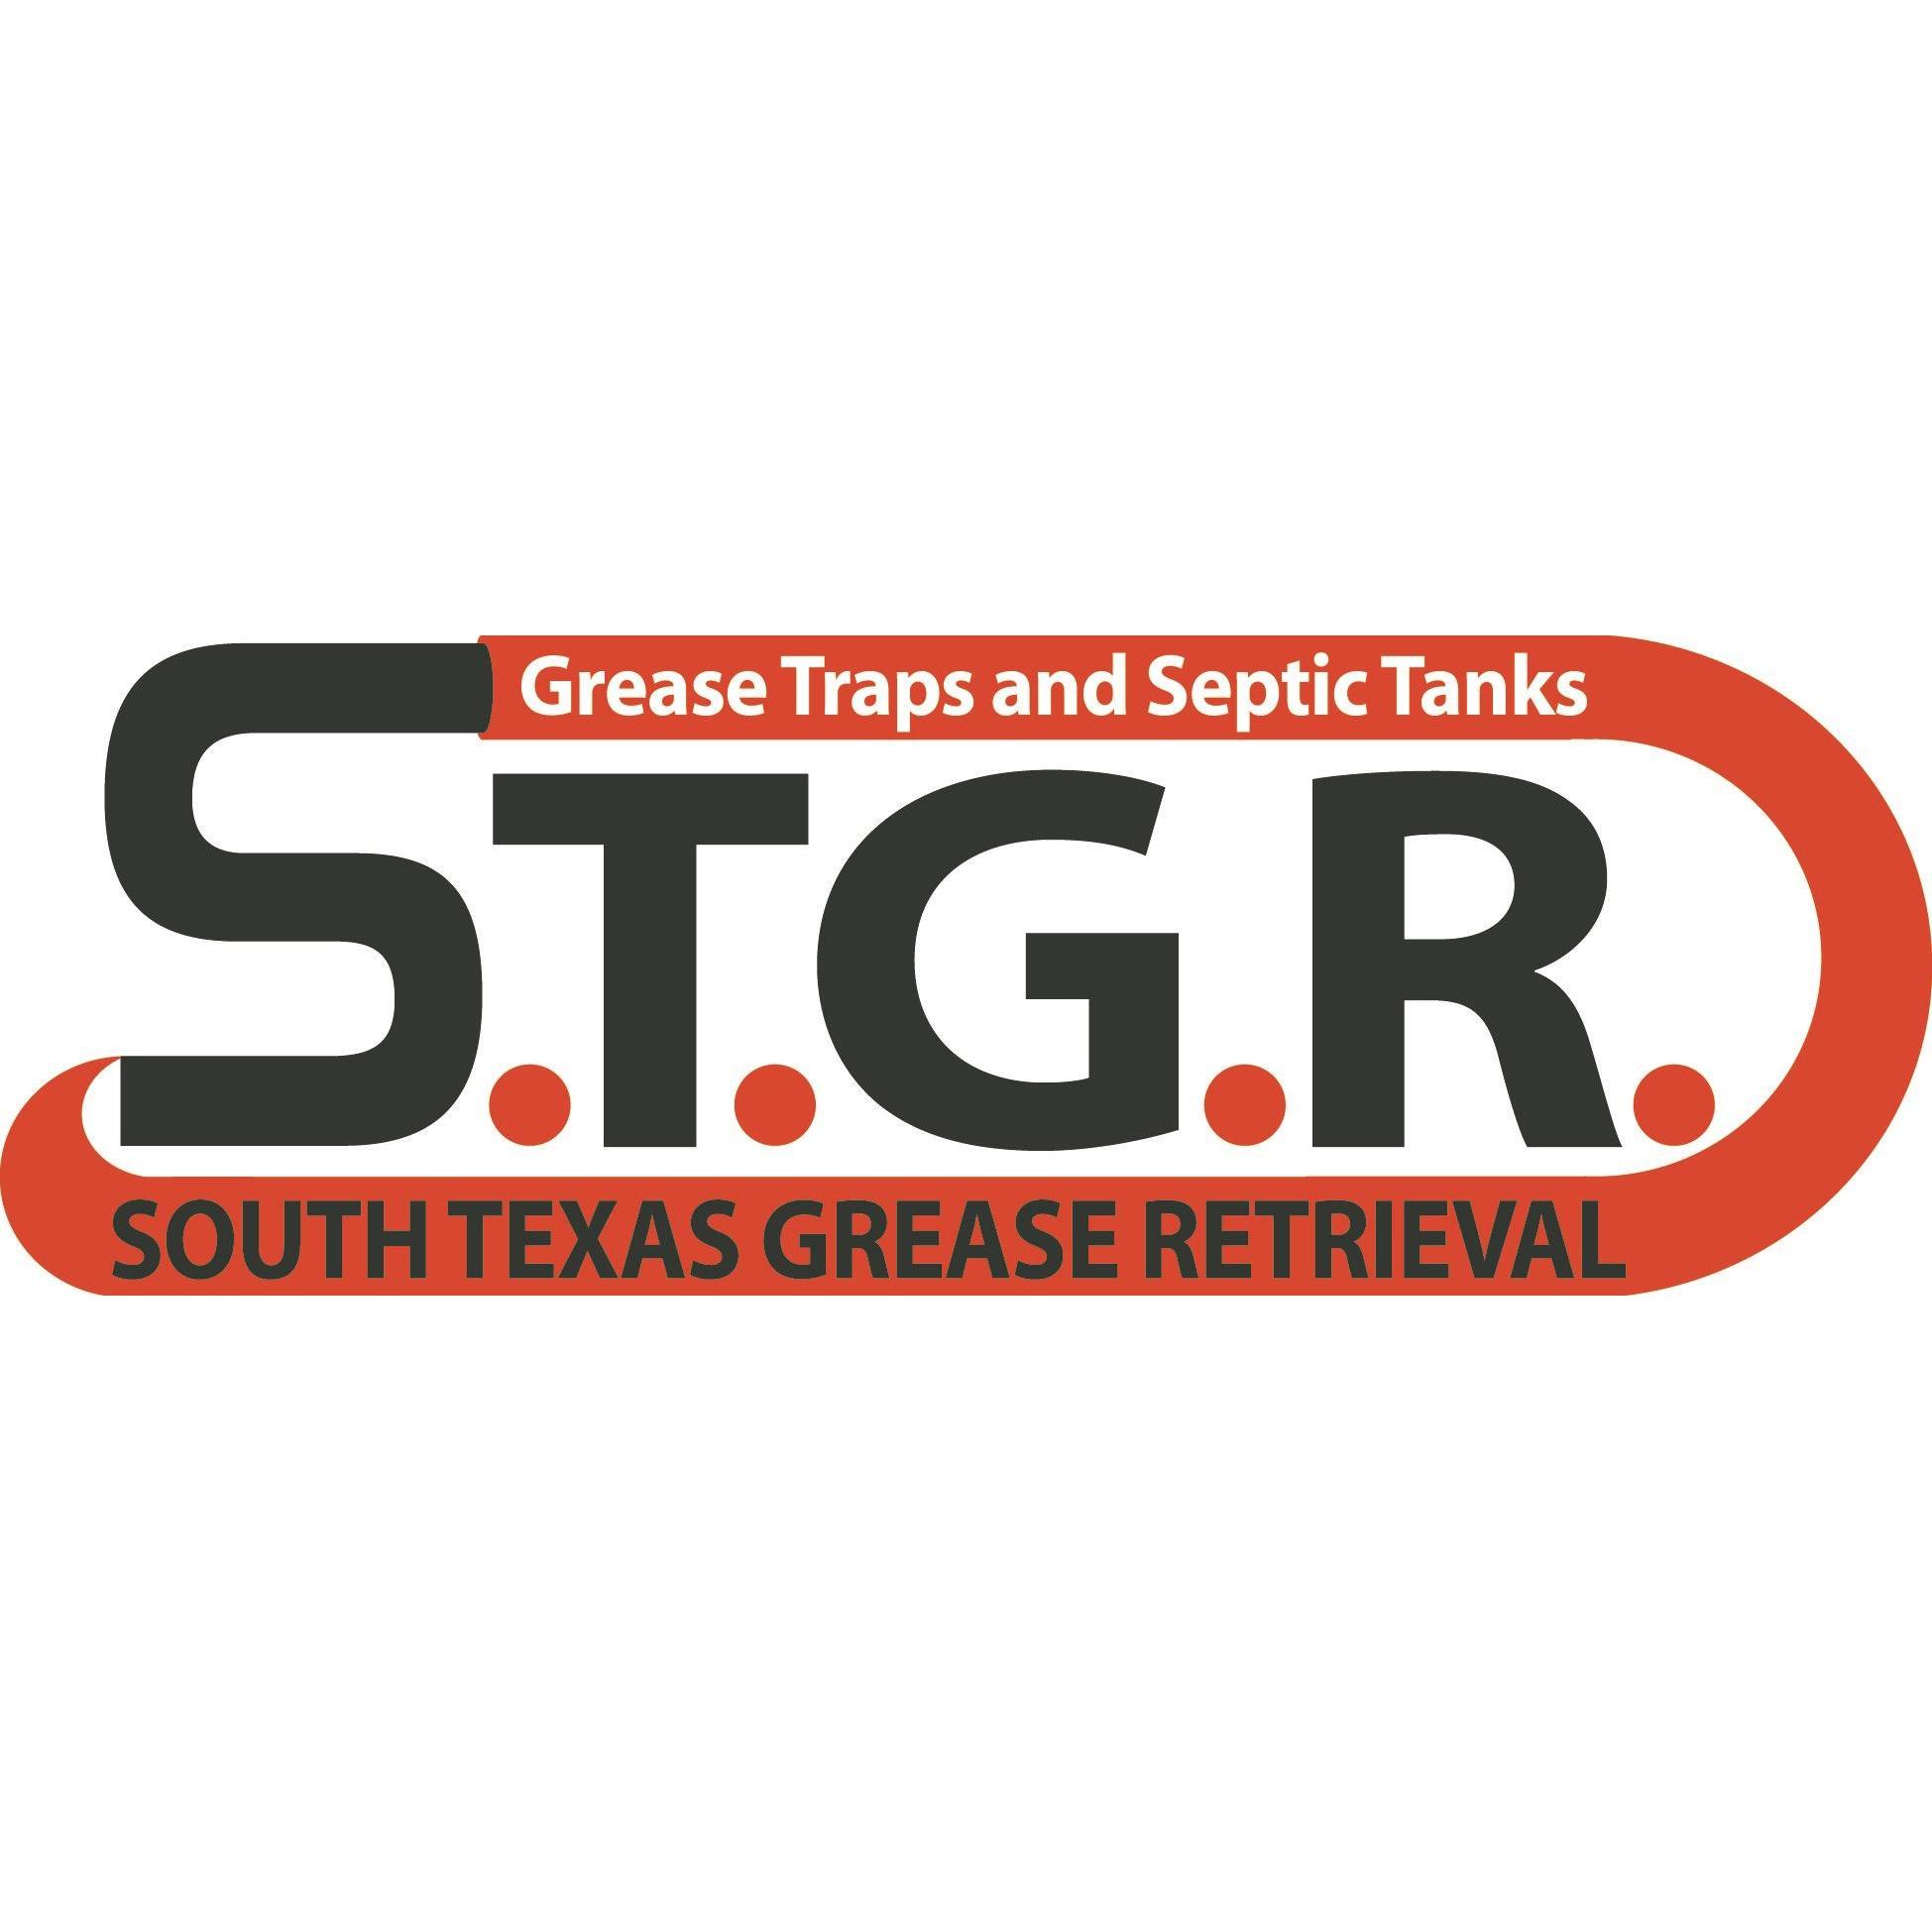 South Texas Grease Retrieval llc. image 0